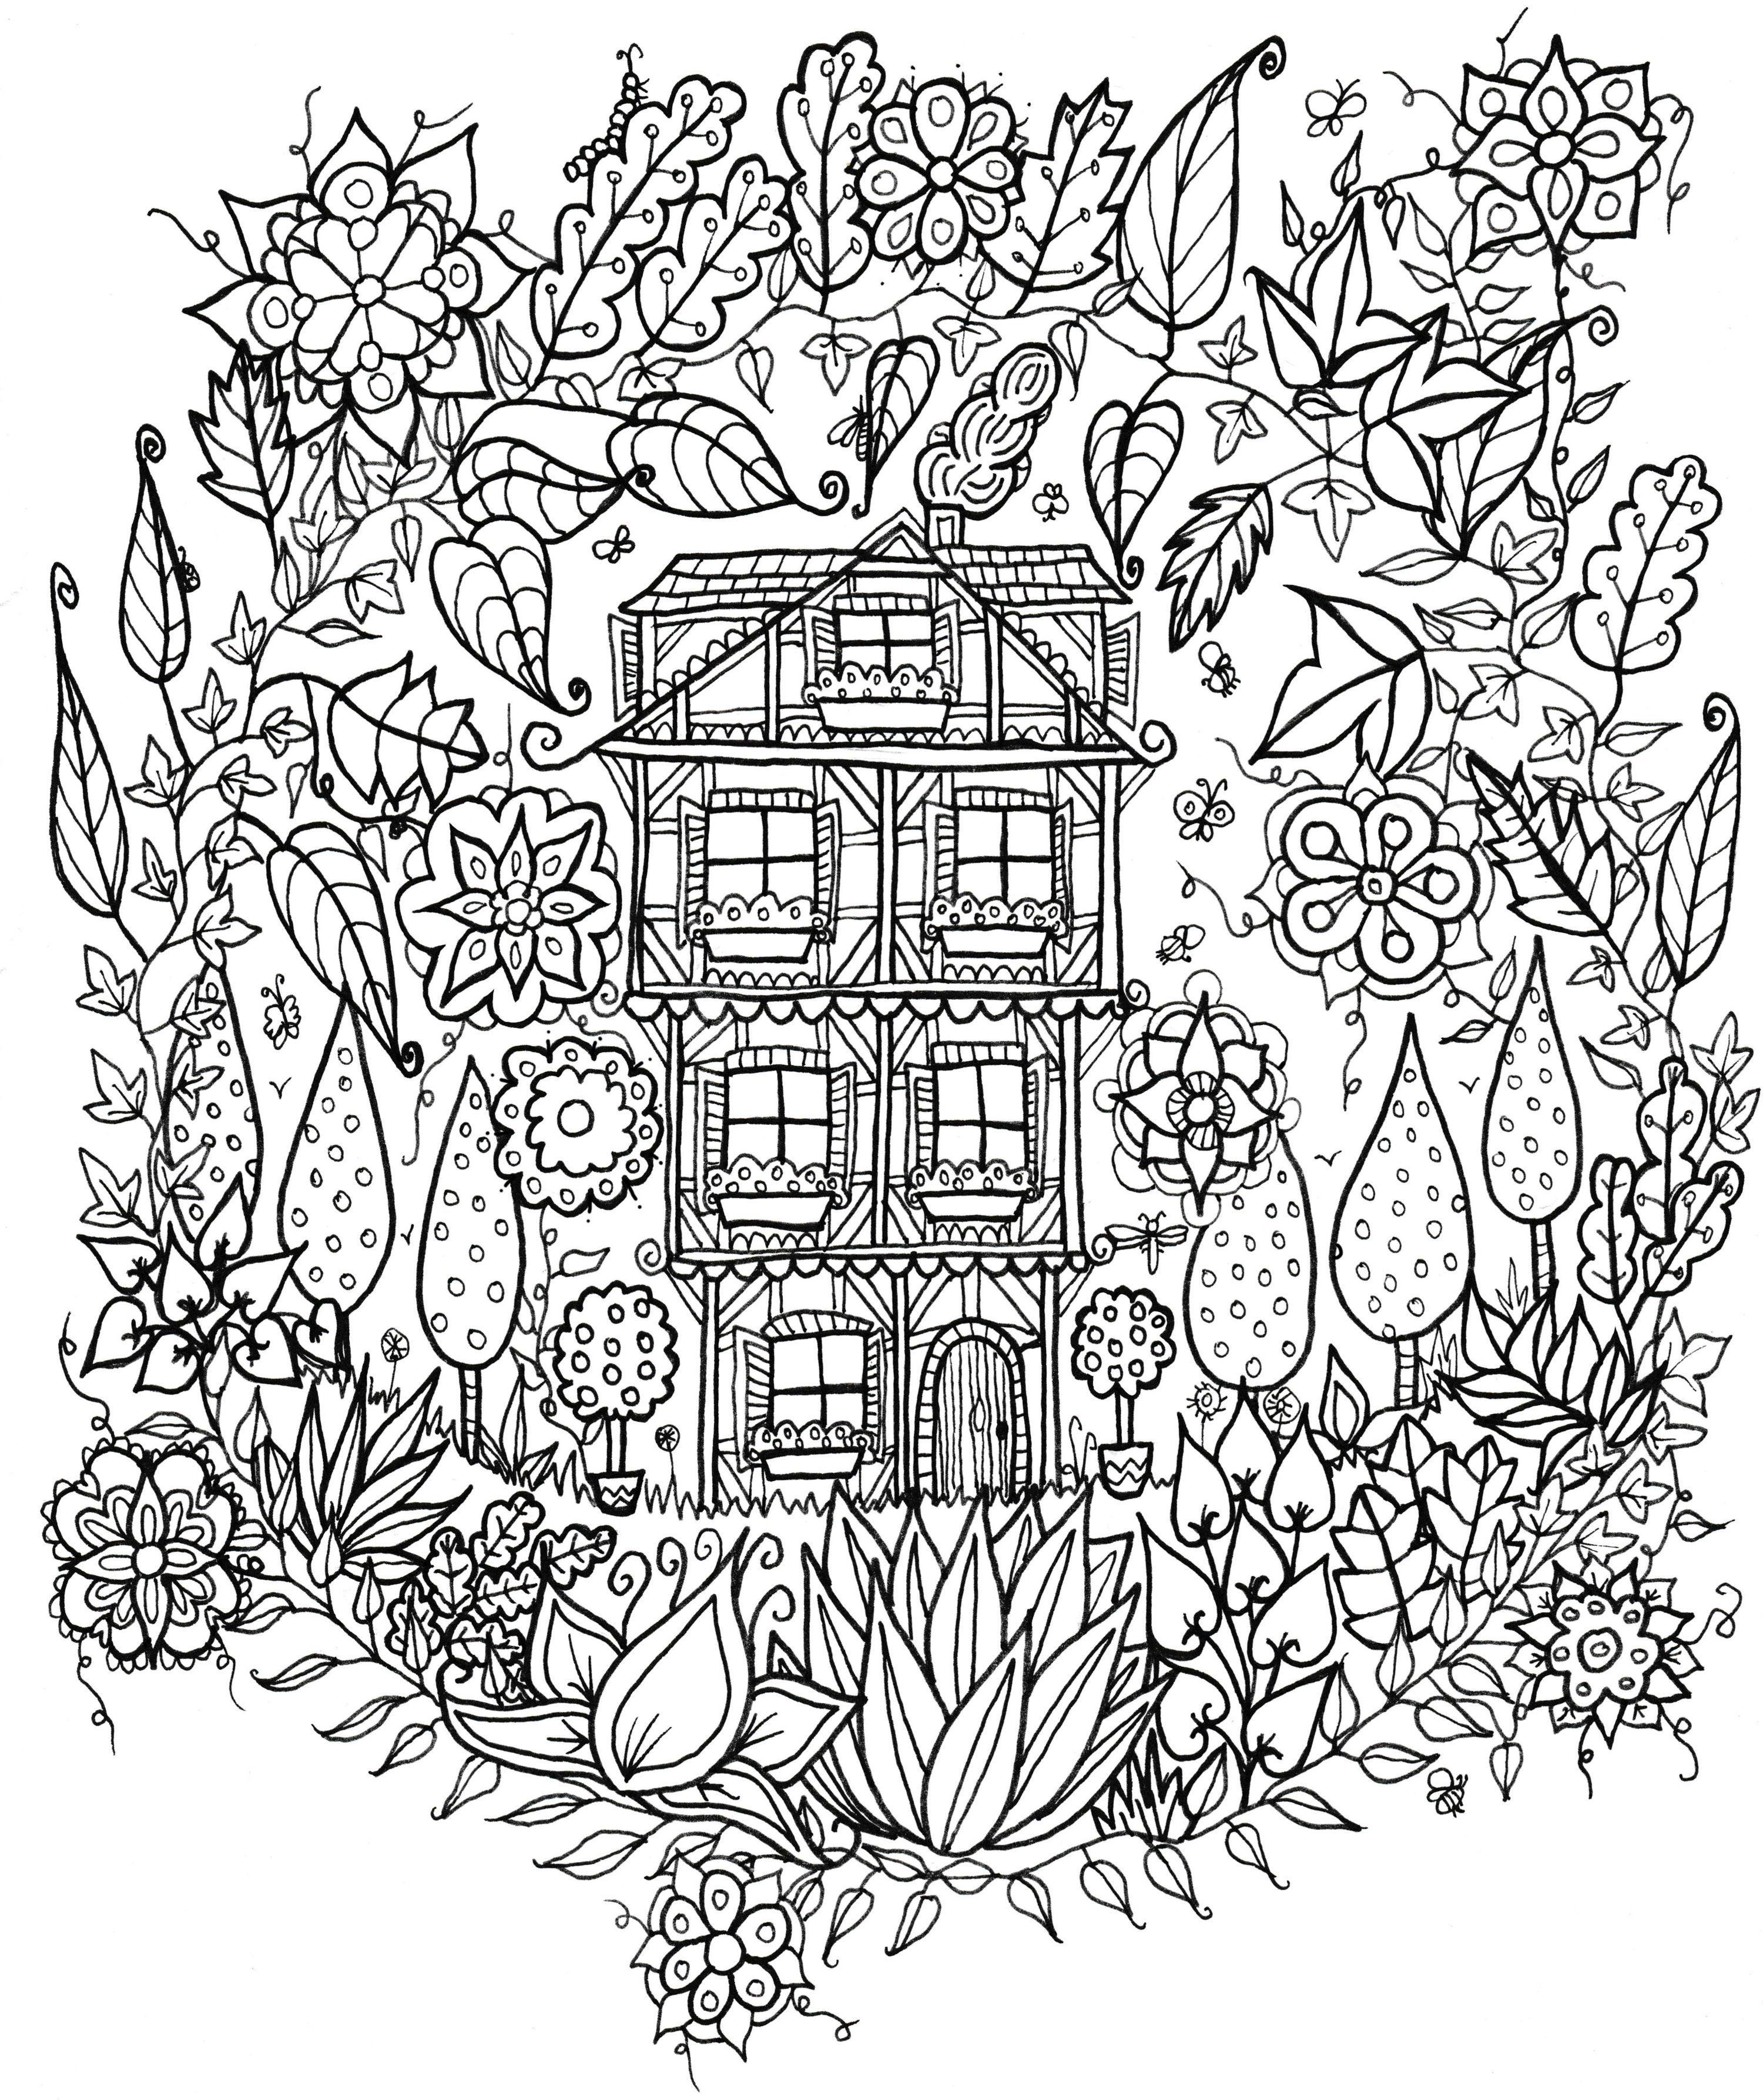 Pin von shannon auf Adult coloring | Pinterest